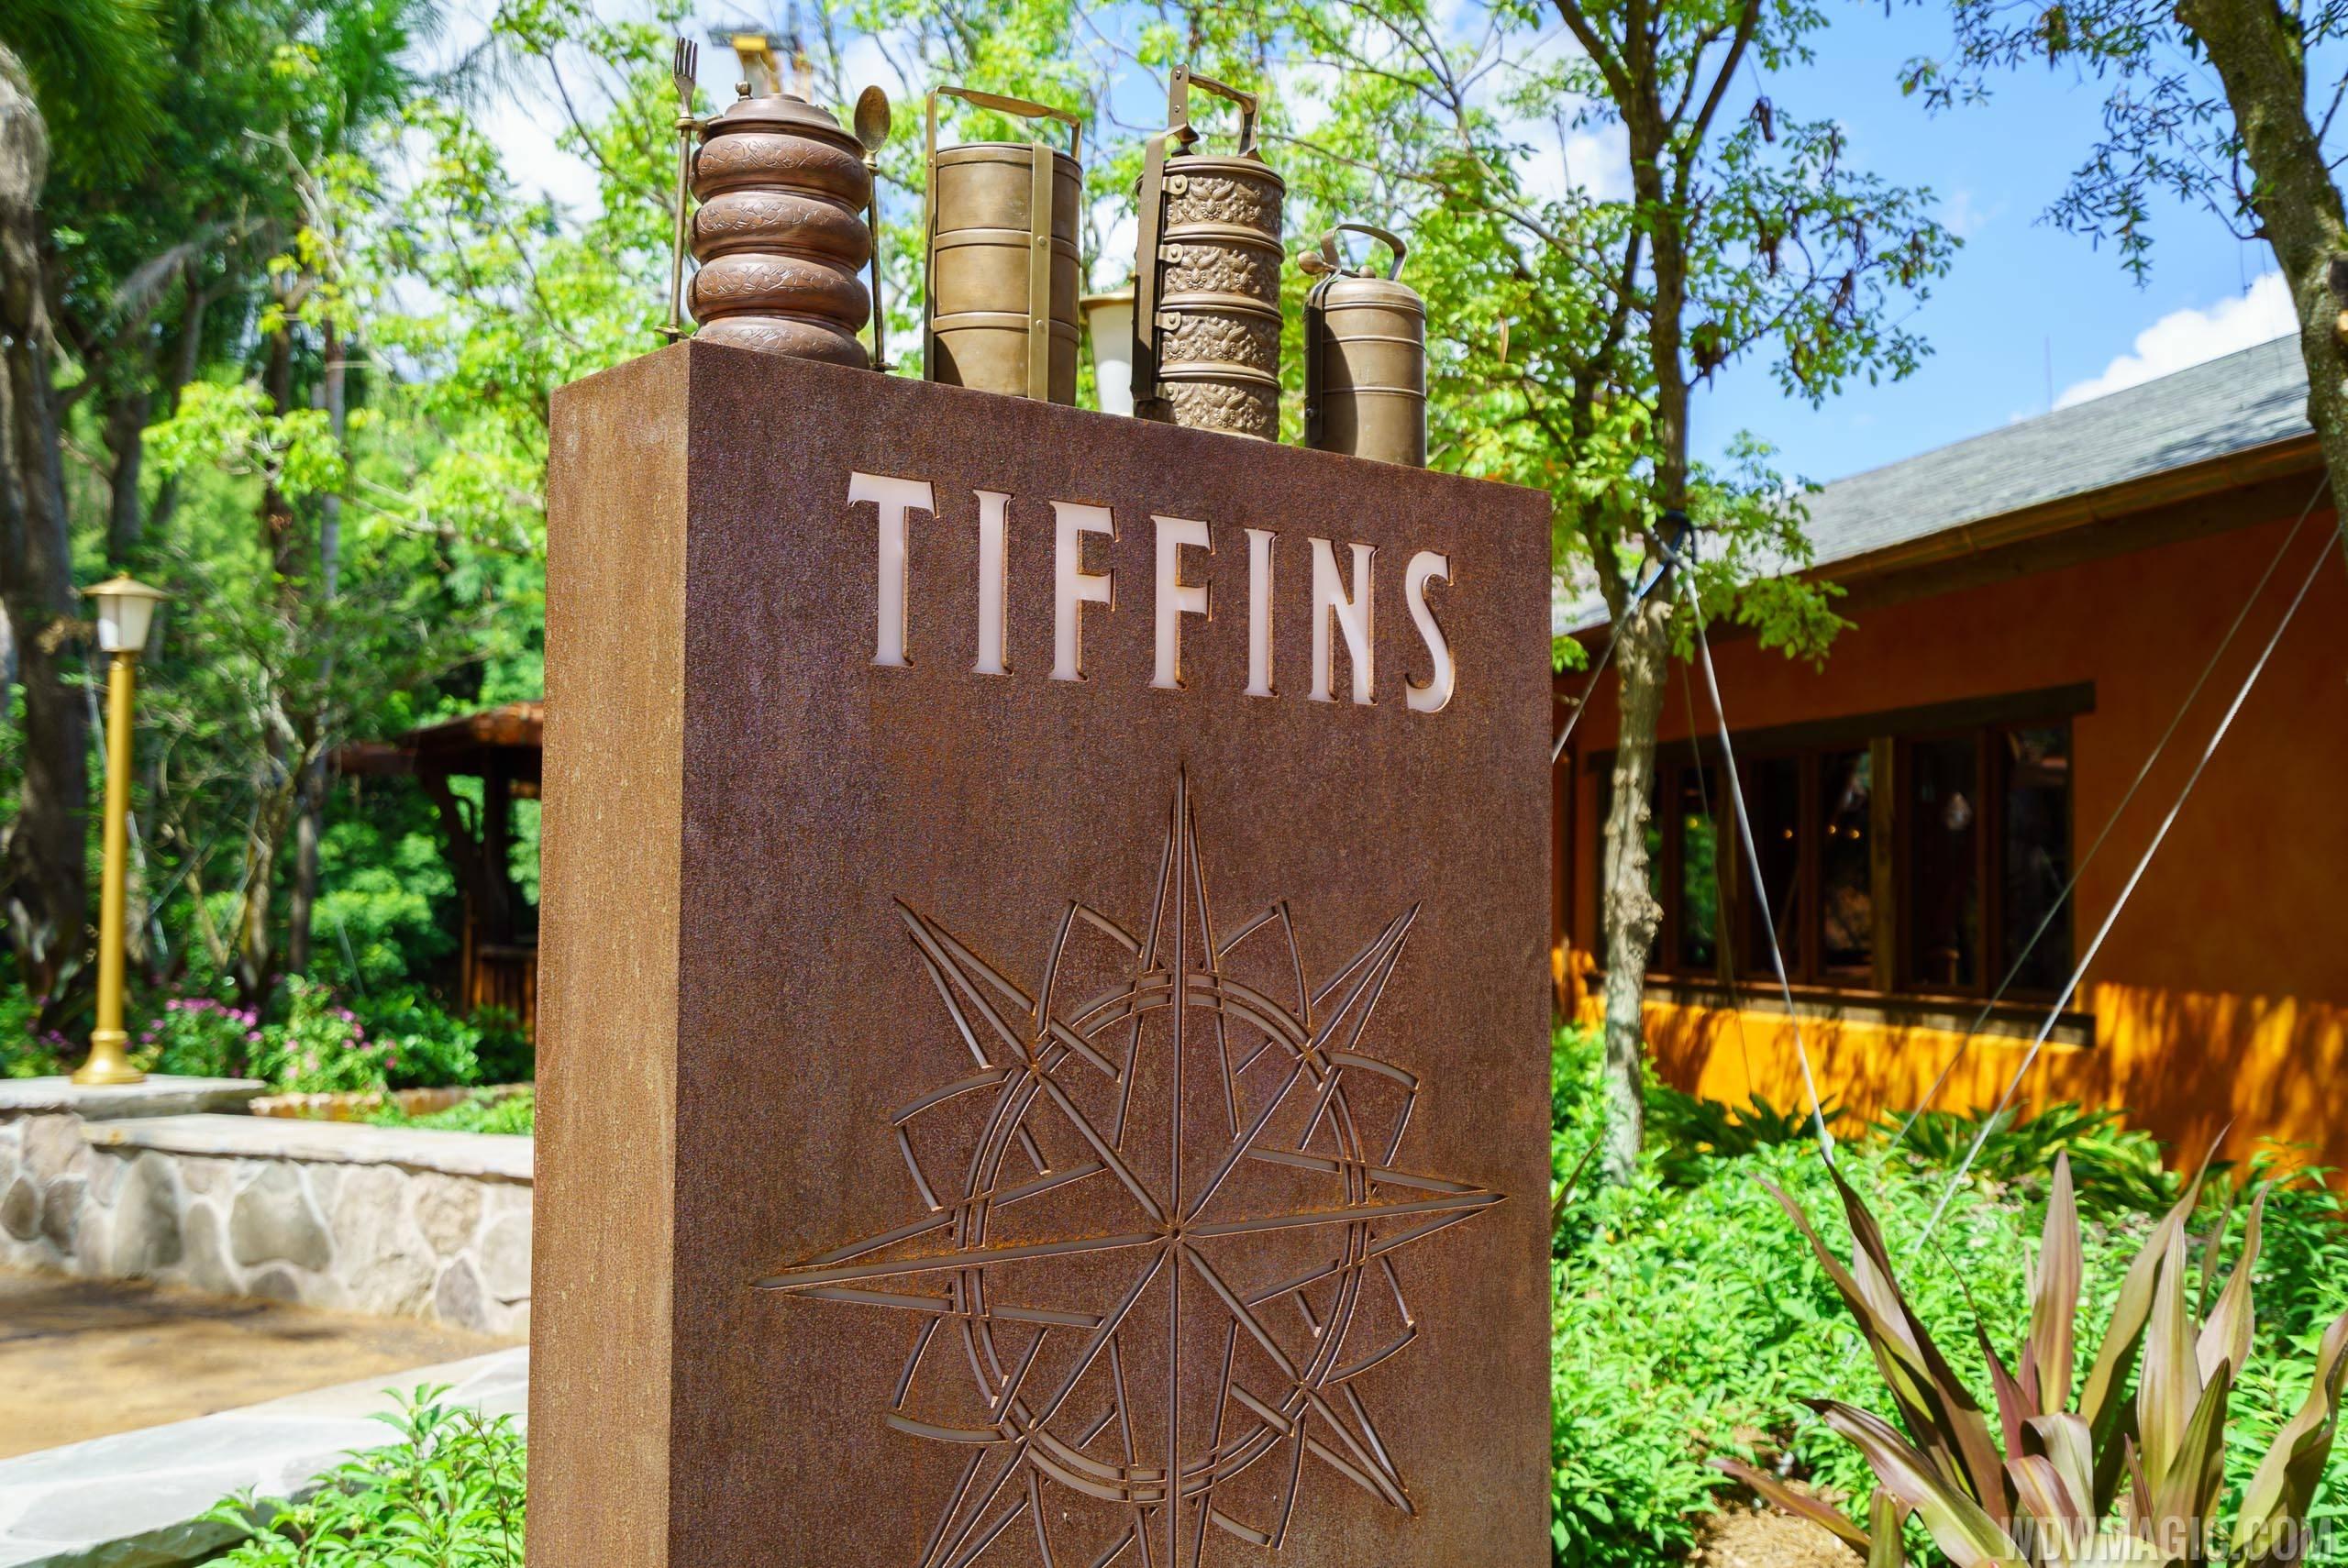 Tiffins overview